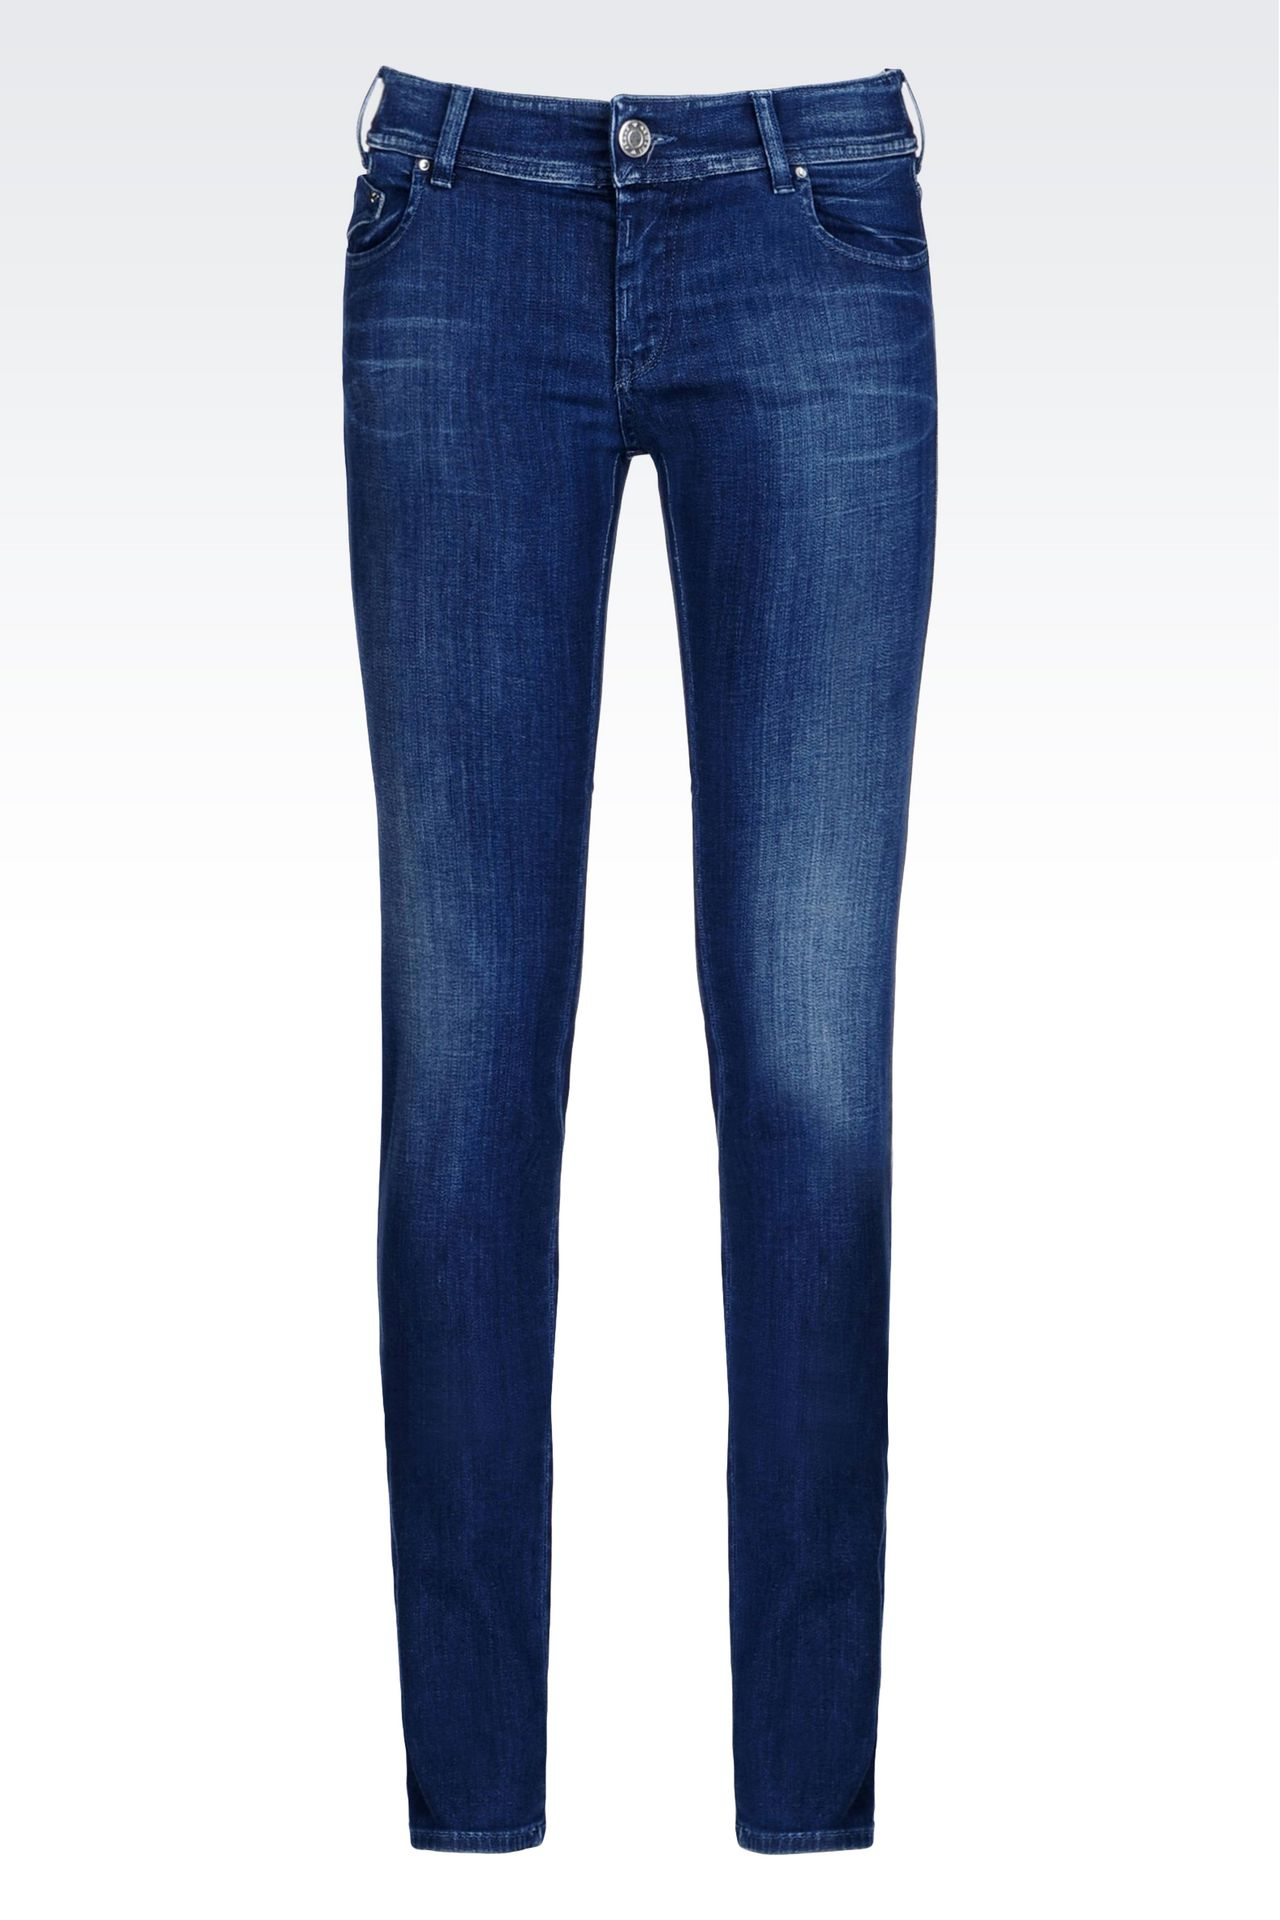 SLIM FIT SUPER STRETCH MEDIUM WASH JEANS: Jeans Women by Armani - 0